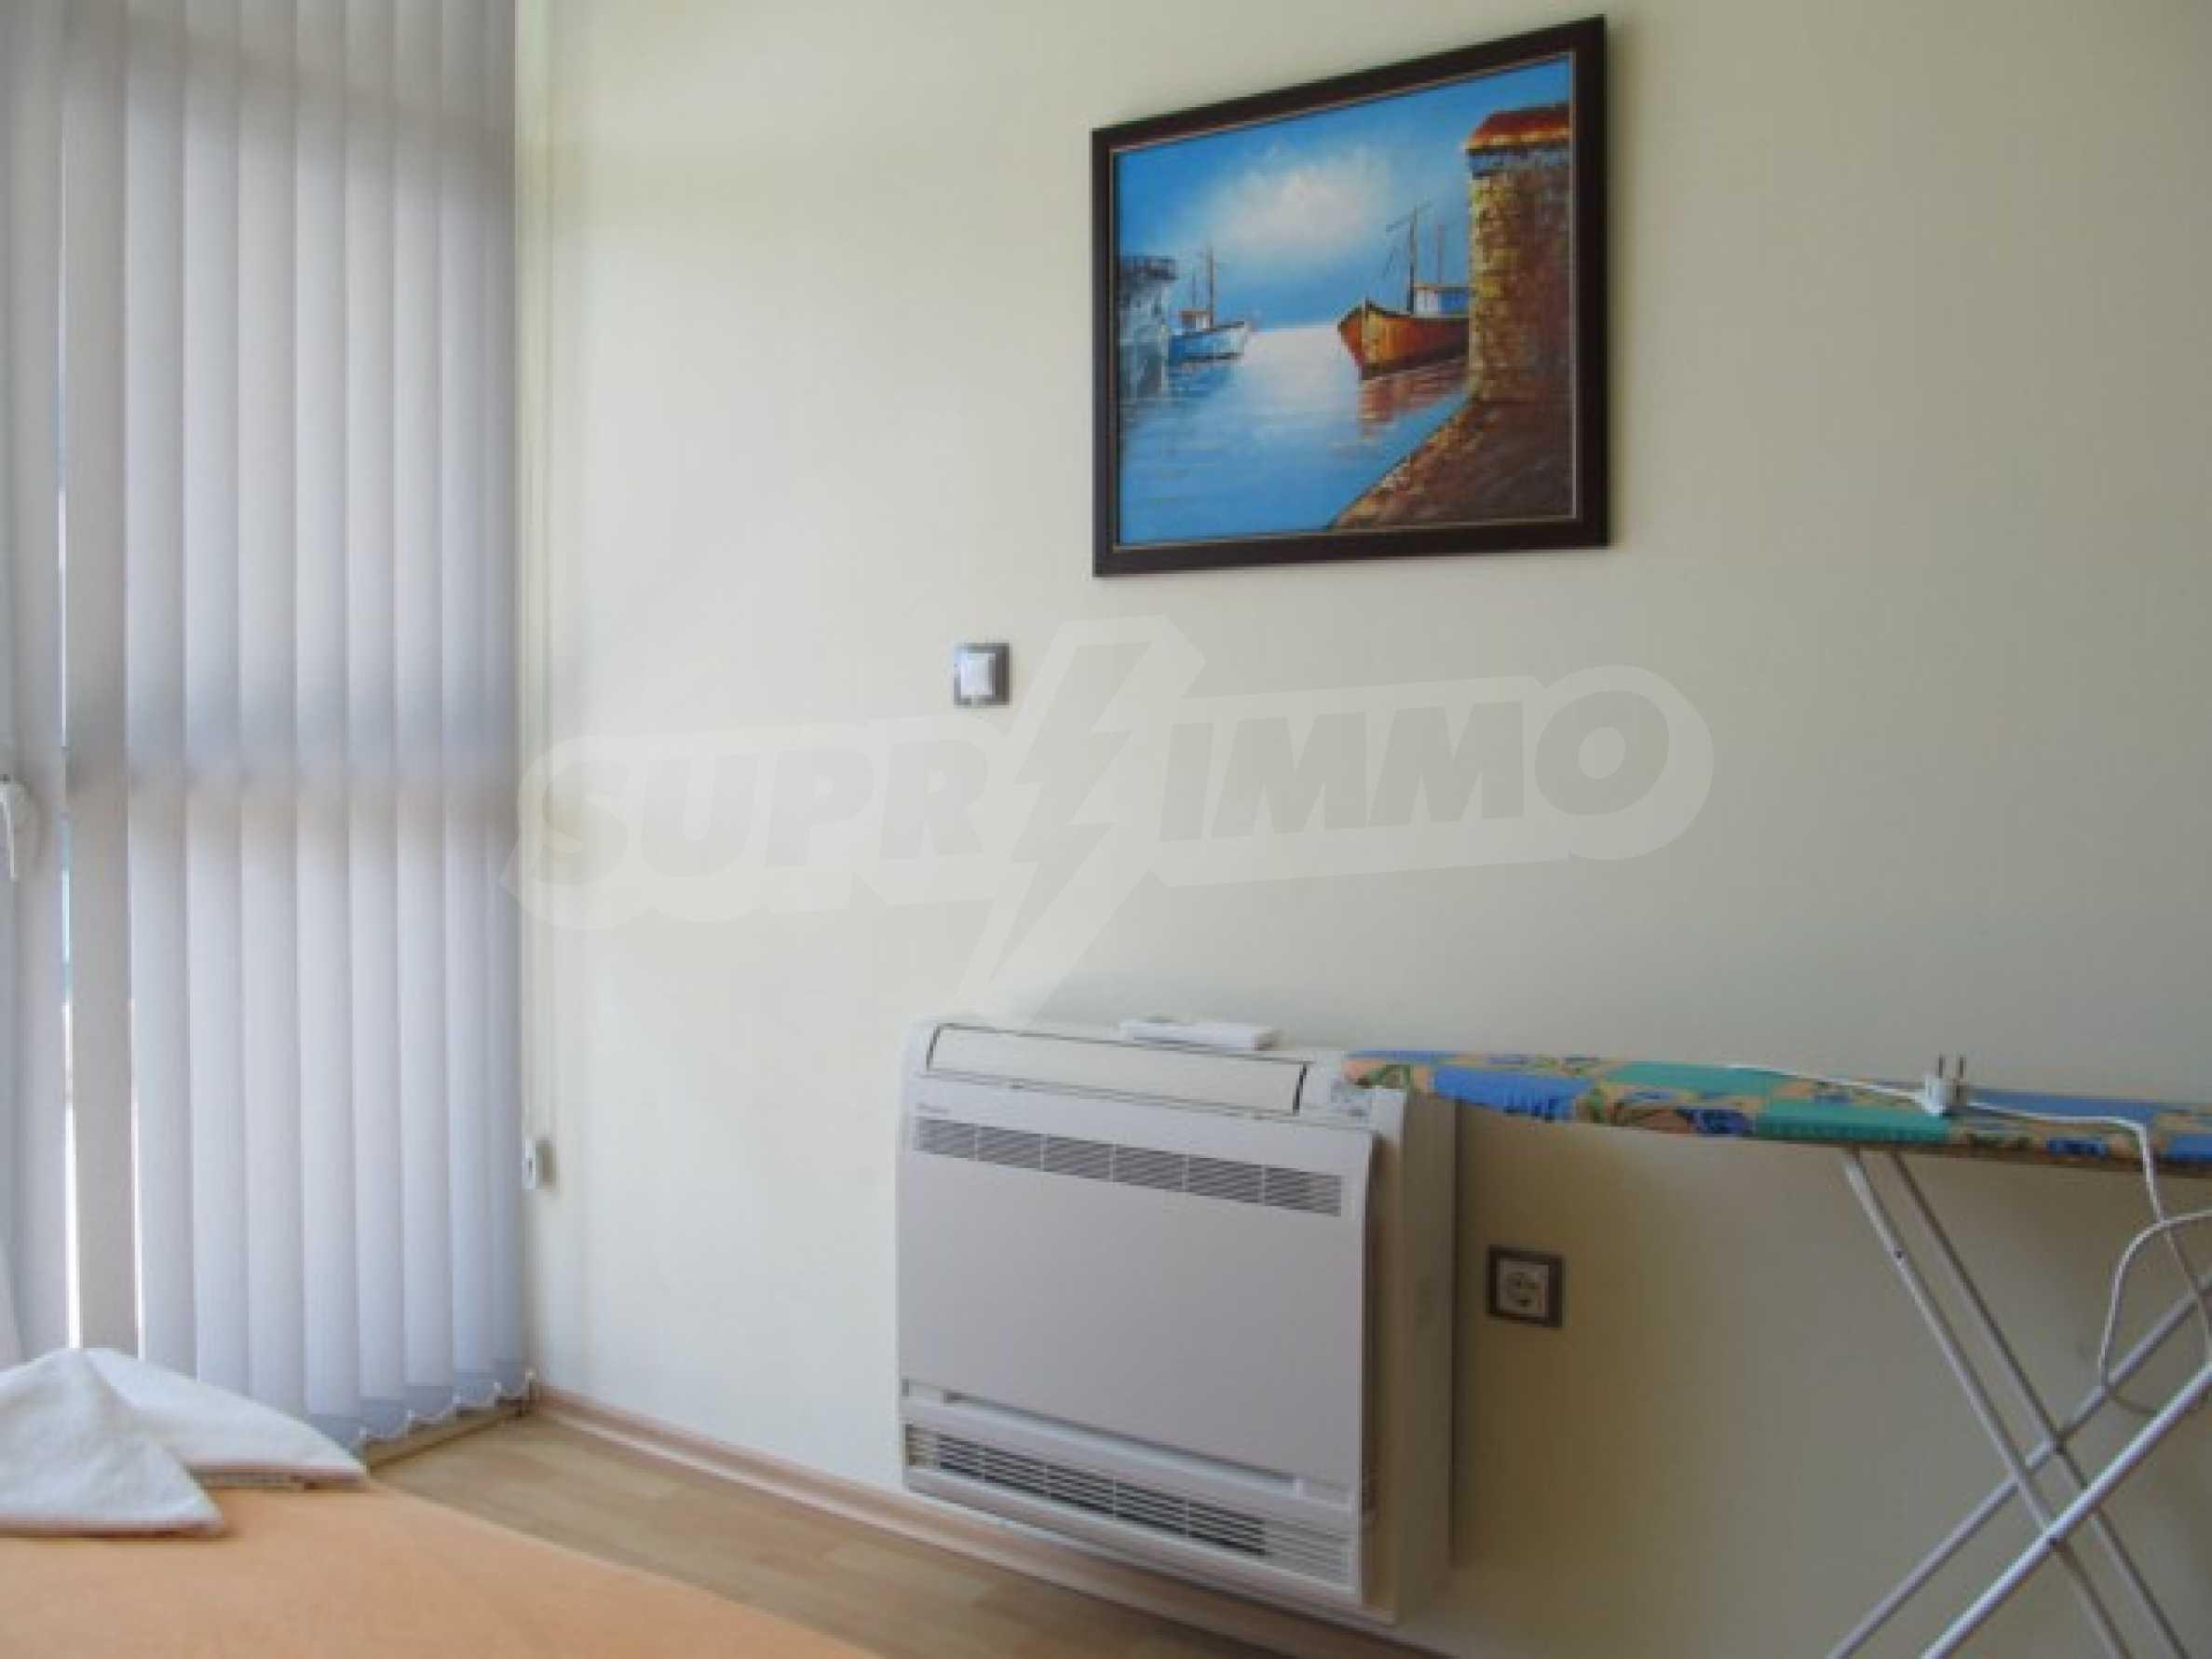 Тристаен апартамент за продажба в Поморие 19